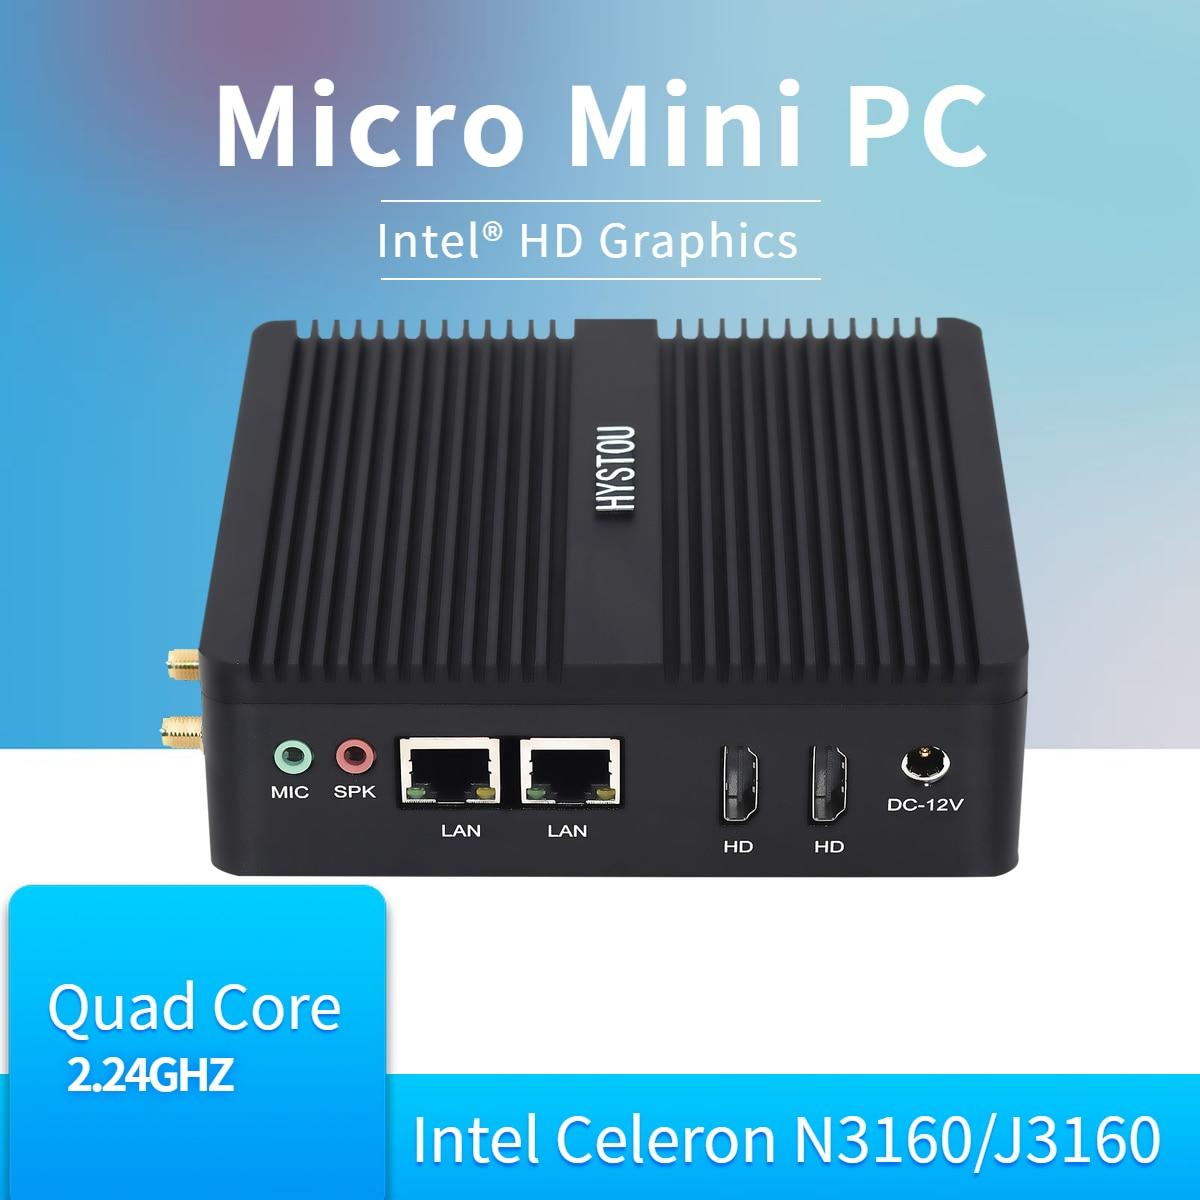 Intel Quad Core Celeron N3160 Fanless Mini PC Windows 10 Linux PFsense Router Server Computer Industrial Minipc 2 LAN HD 1 RS232